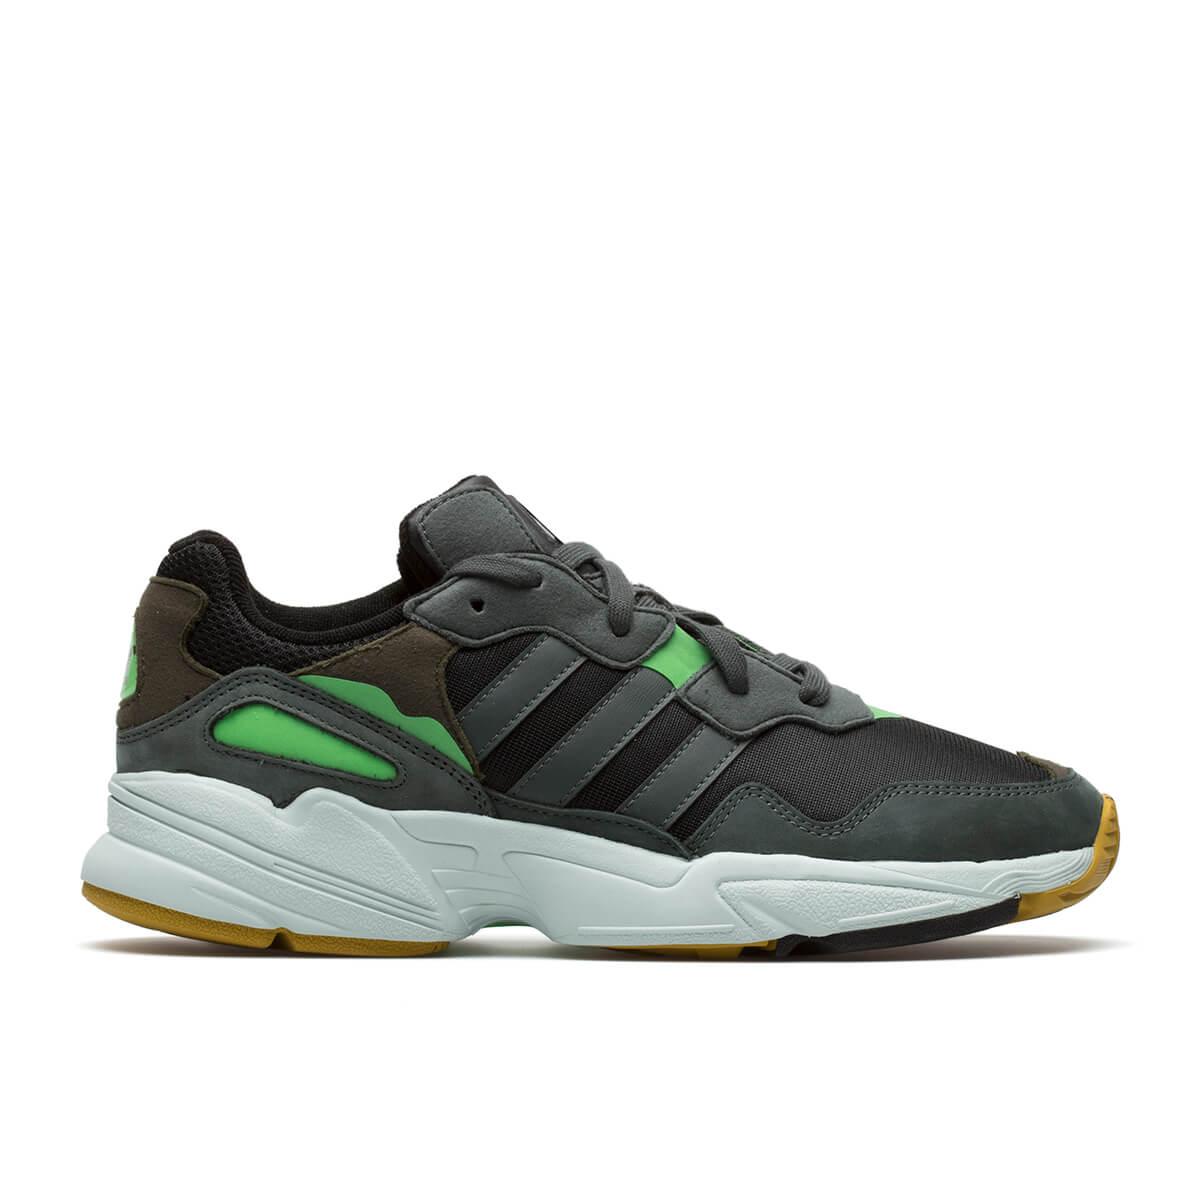 Adidas Originals Yung-96